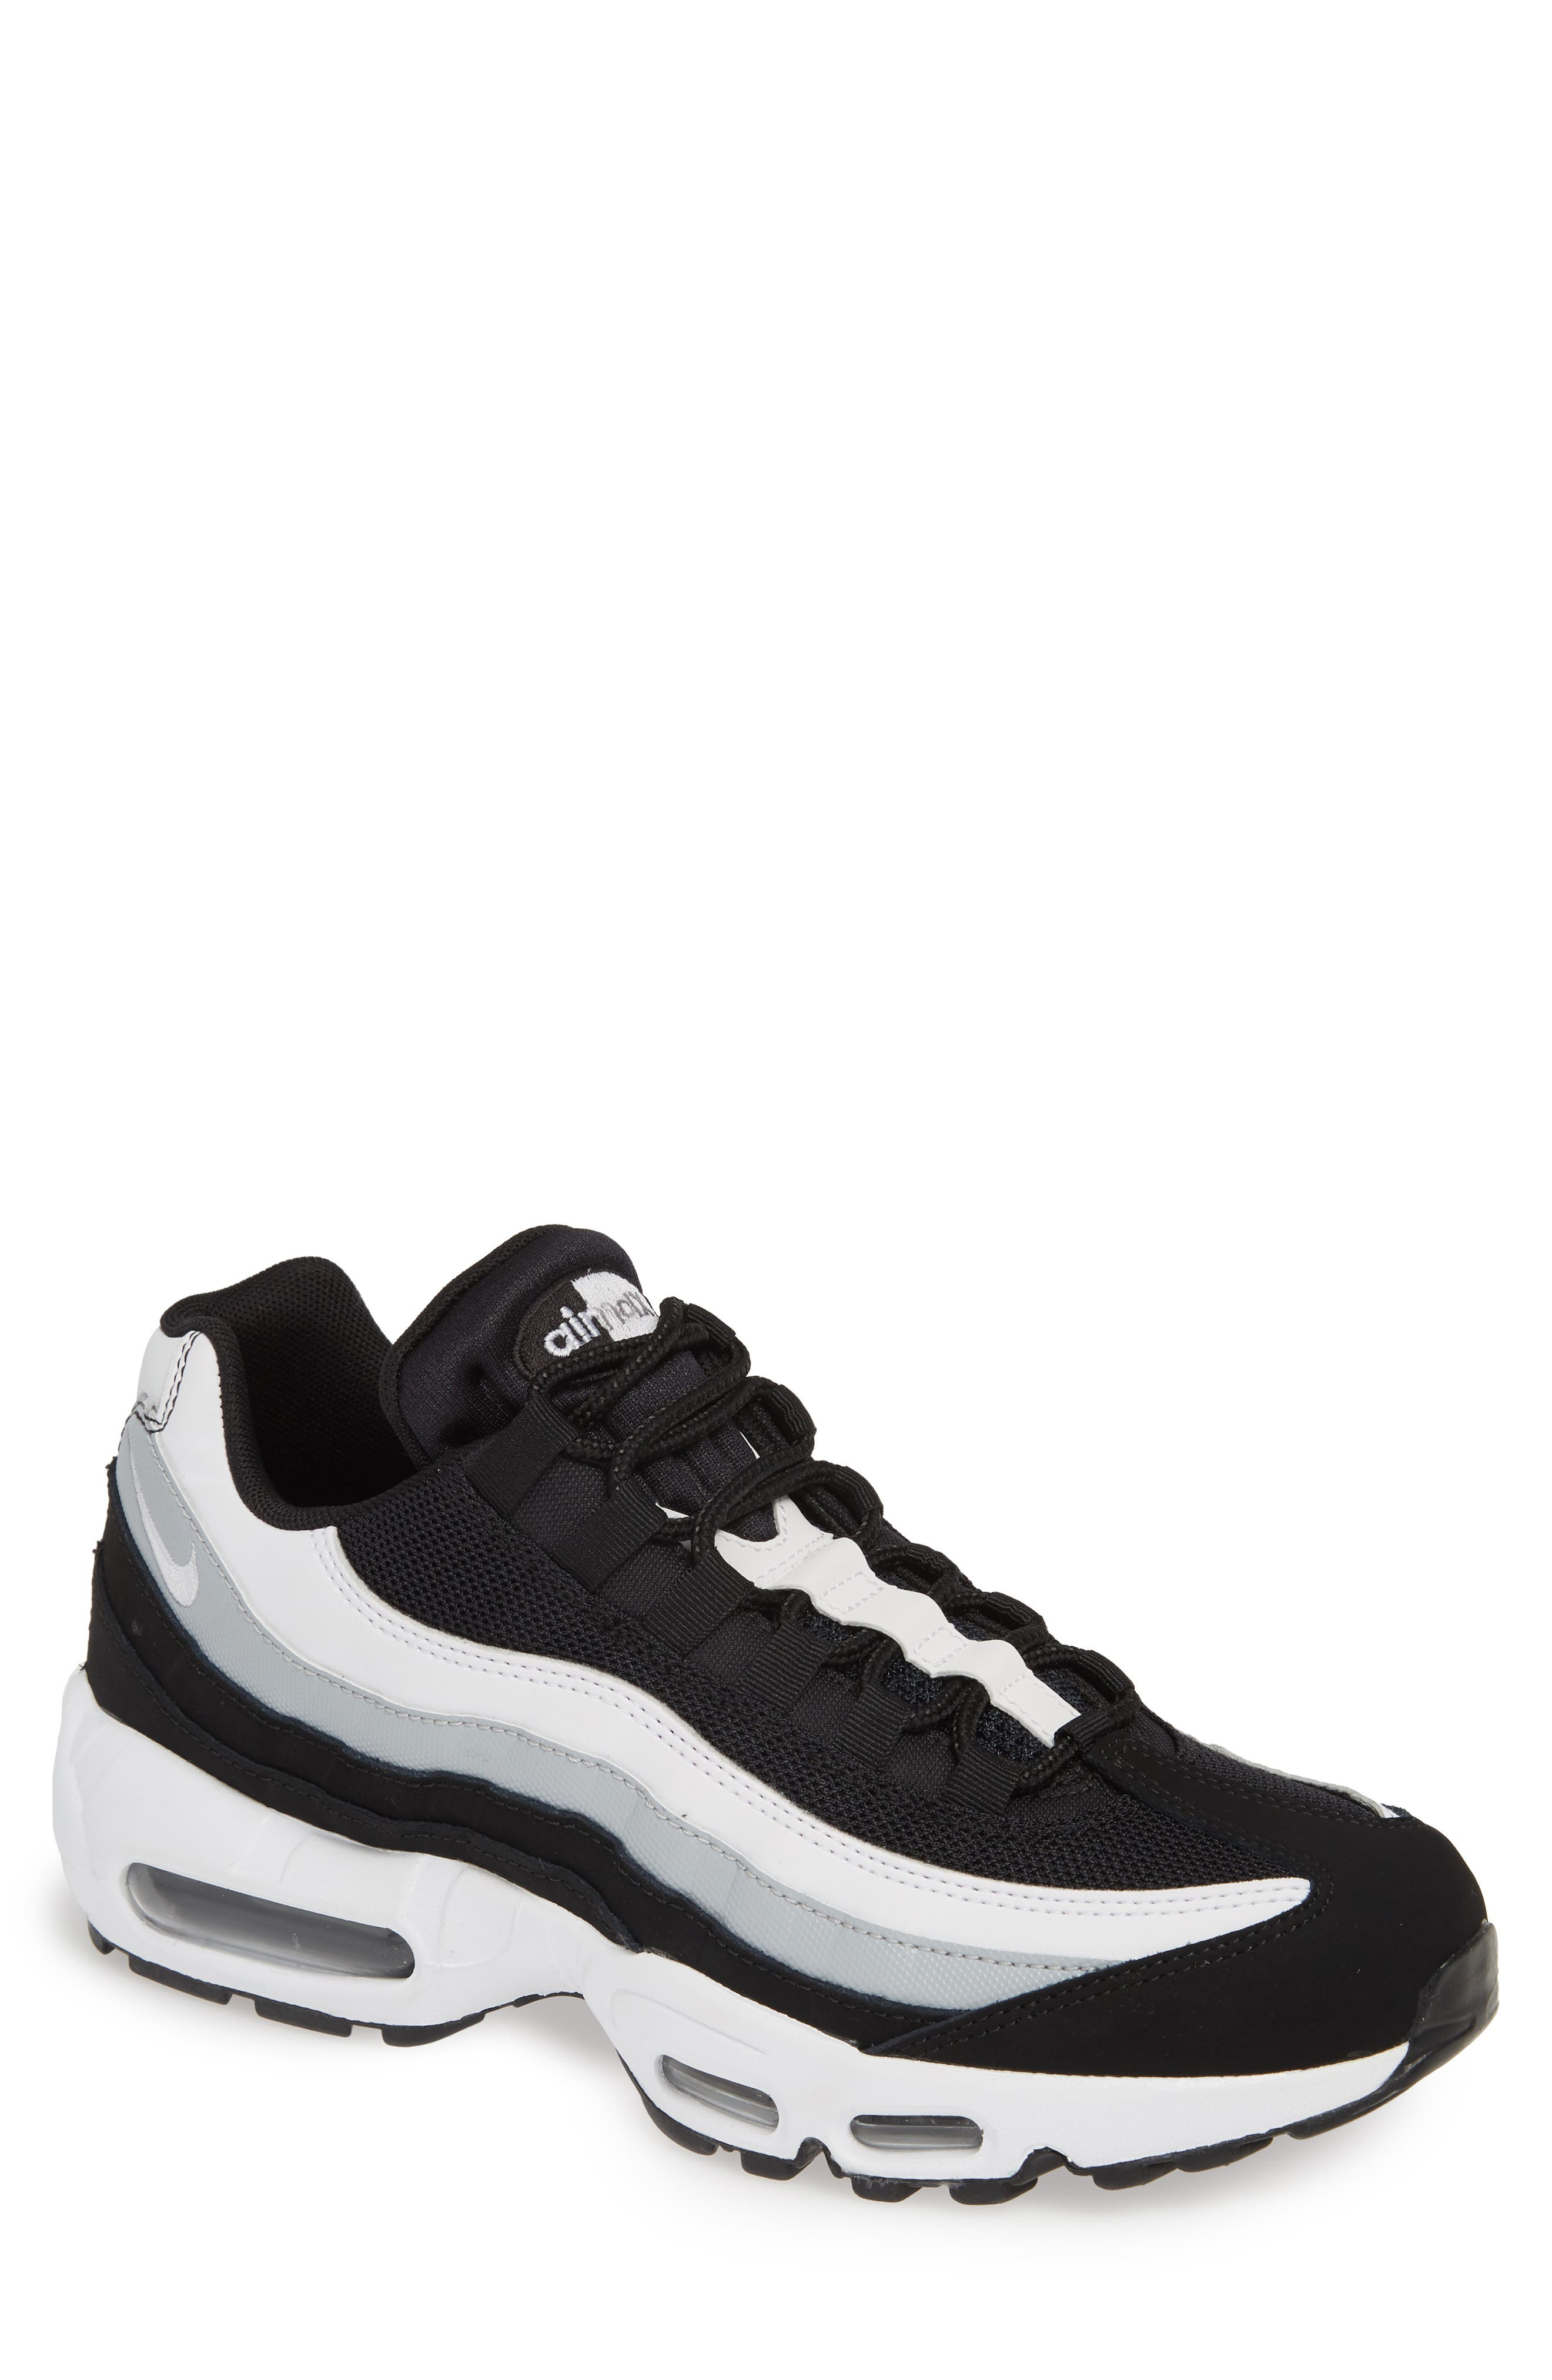 Nike Air Max Shoes  5179c5479